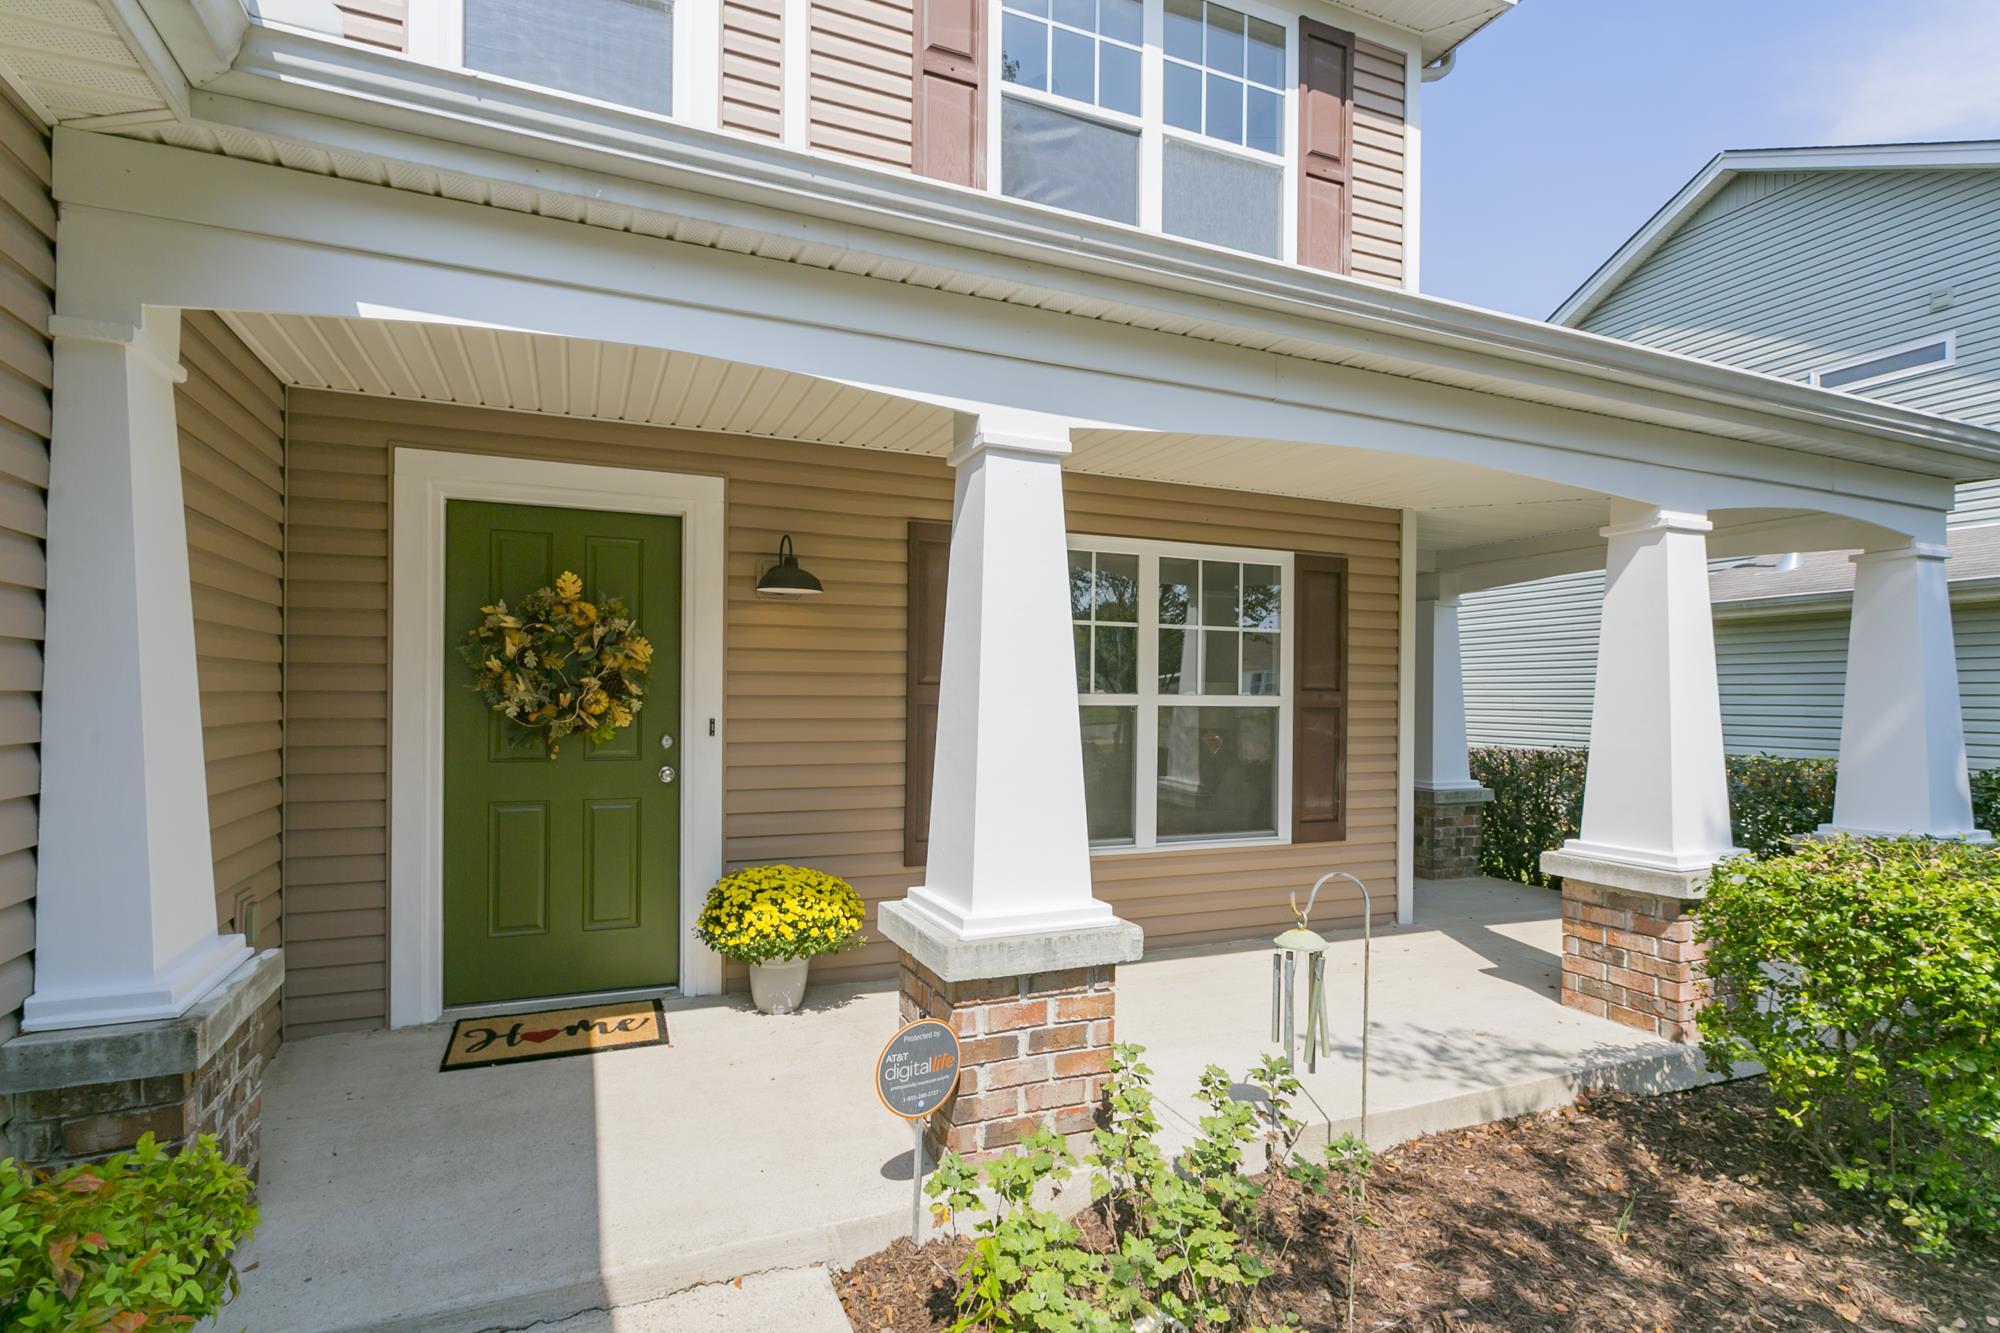 4617 Cather Ct, Nashville, TN 37214 - Nashville, TN real estate listing